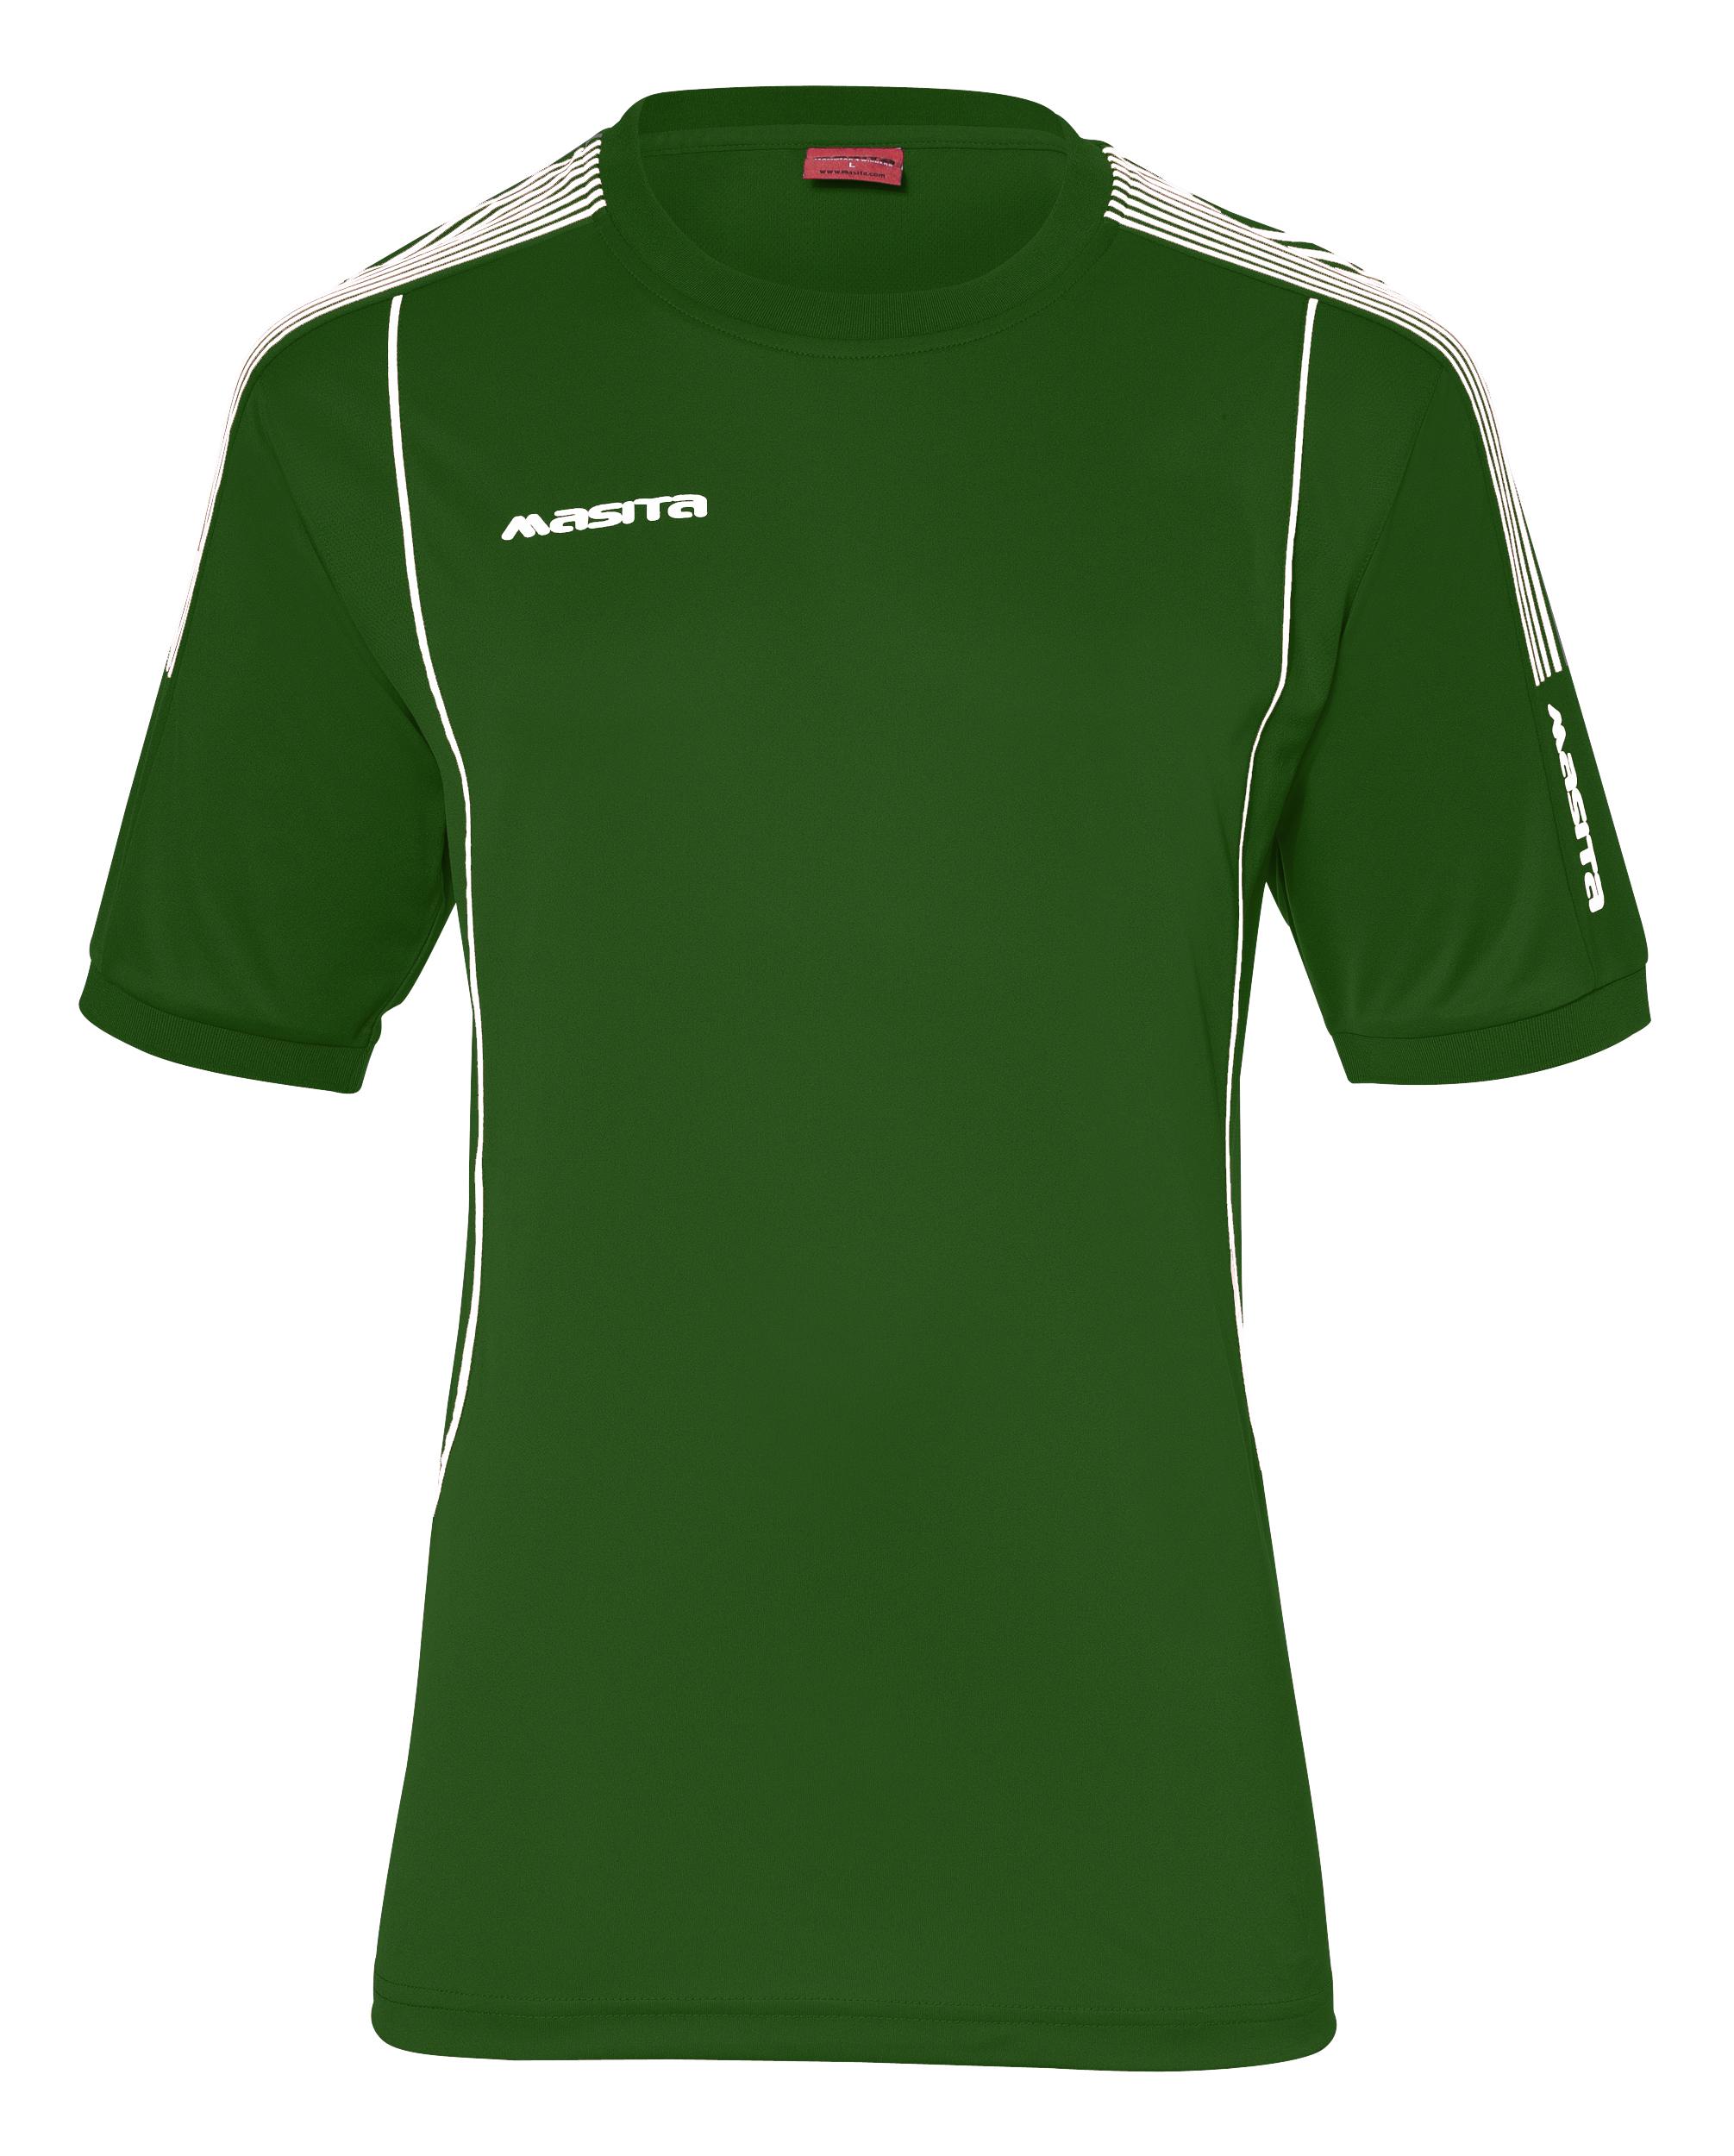 T-Shirt Barca  Green / White